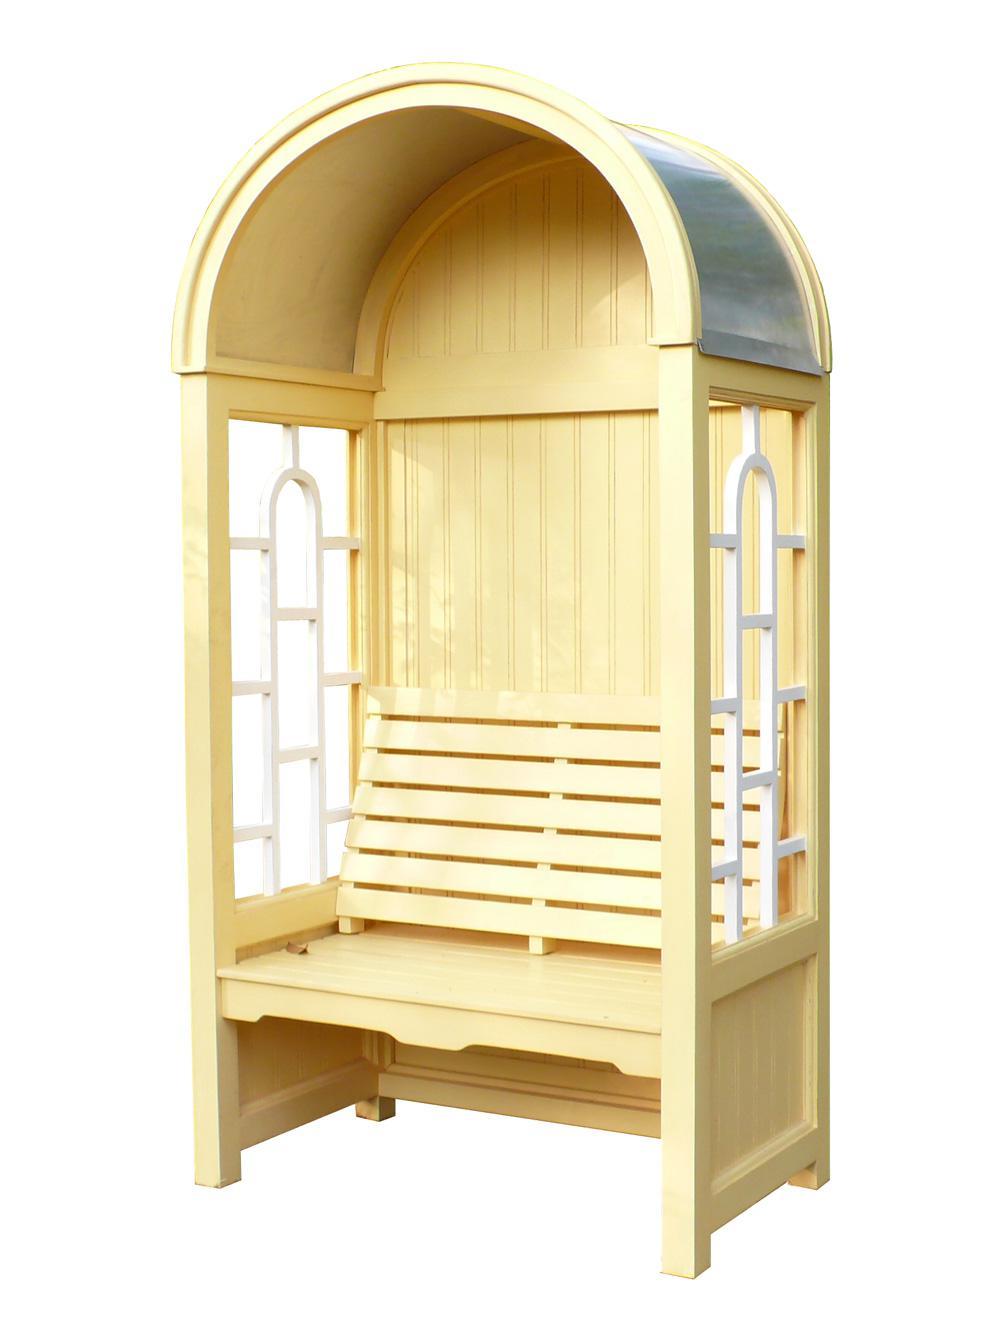 laubenbank romantik philosophenbank mahagoni holz. Black Bedroom Furniture Sets. Home Design Ideas